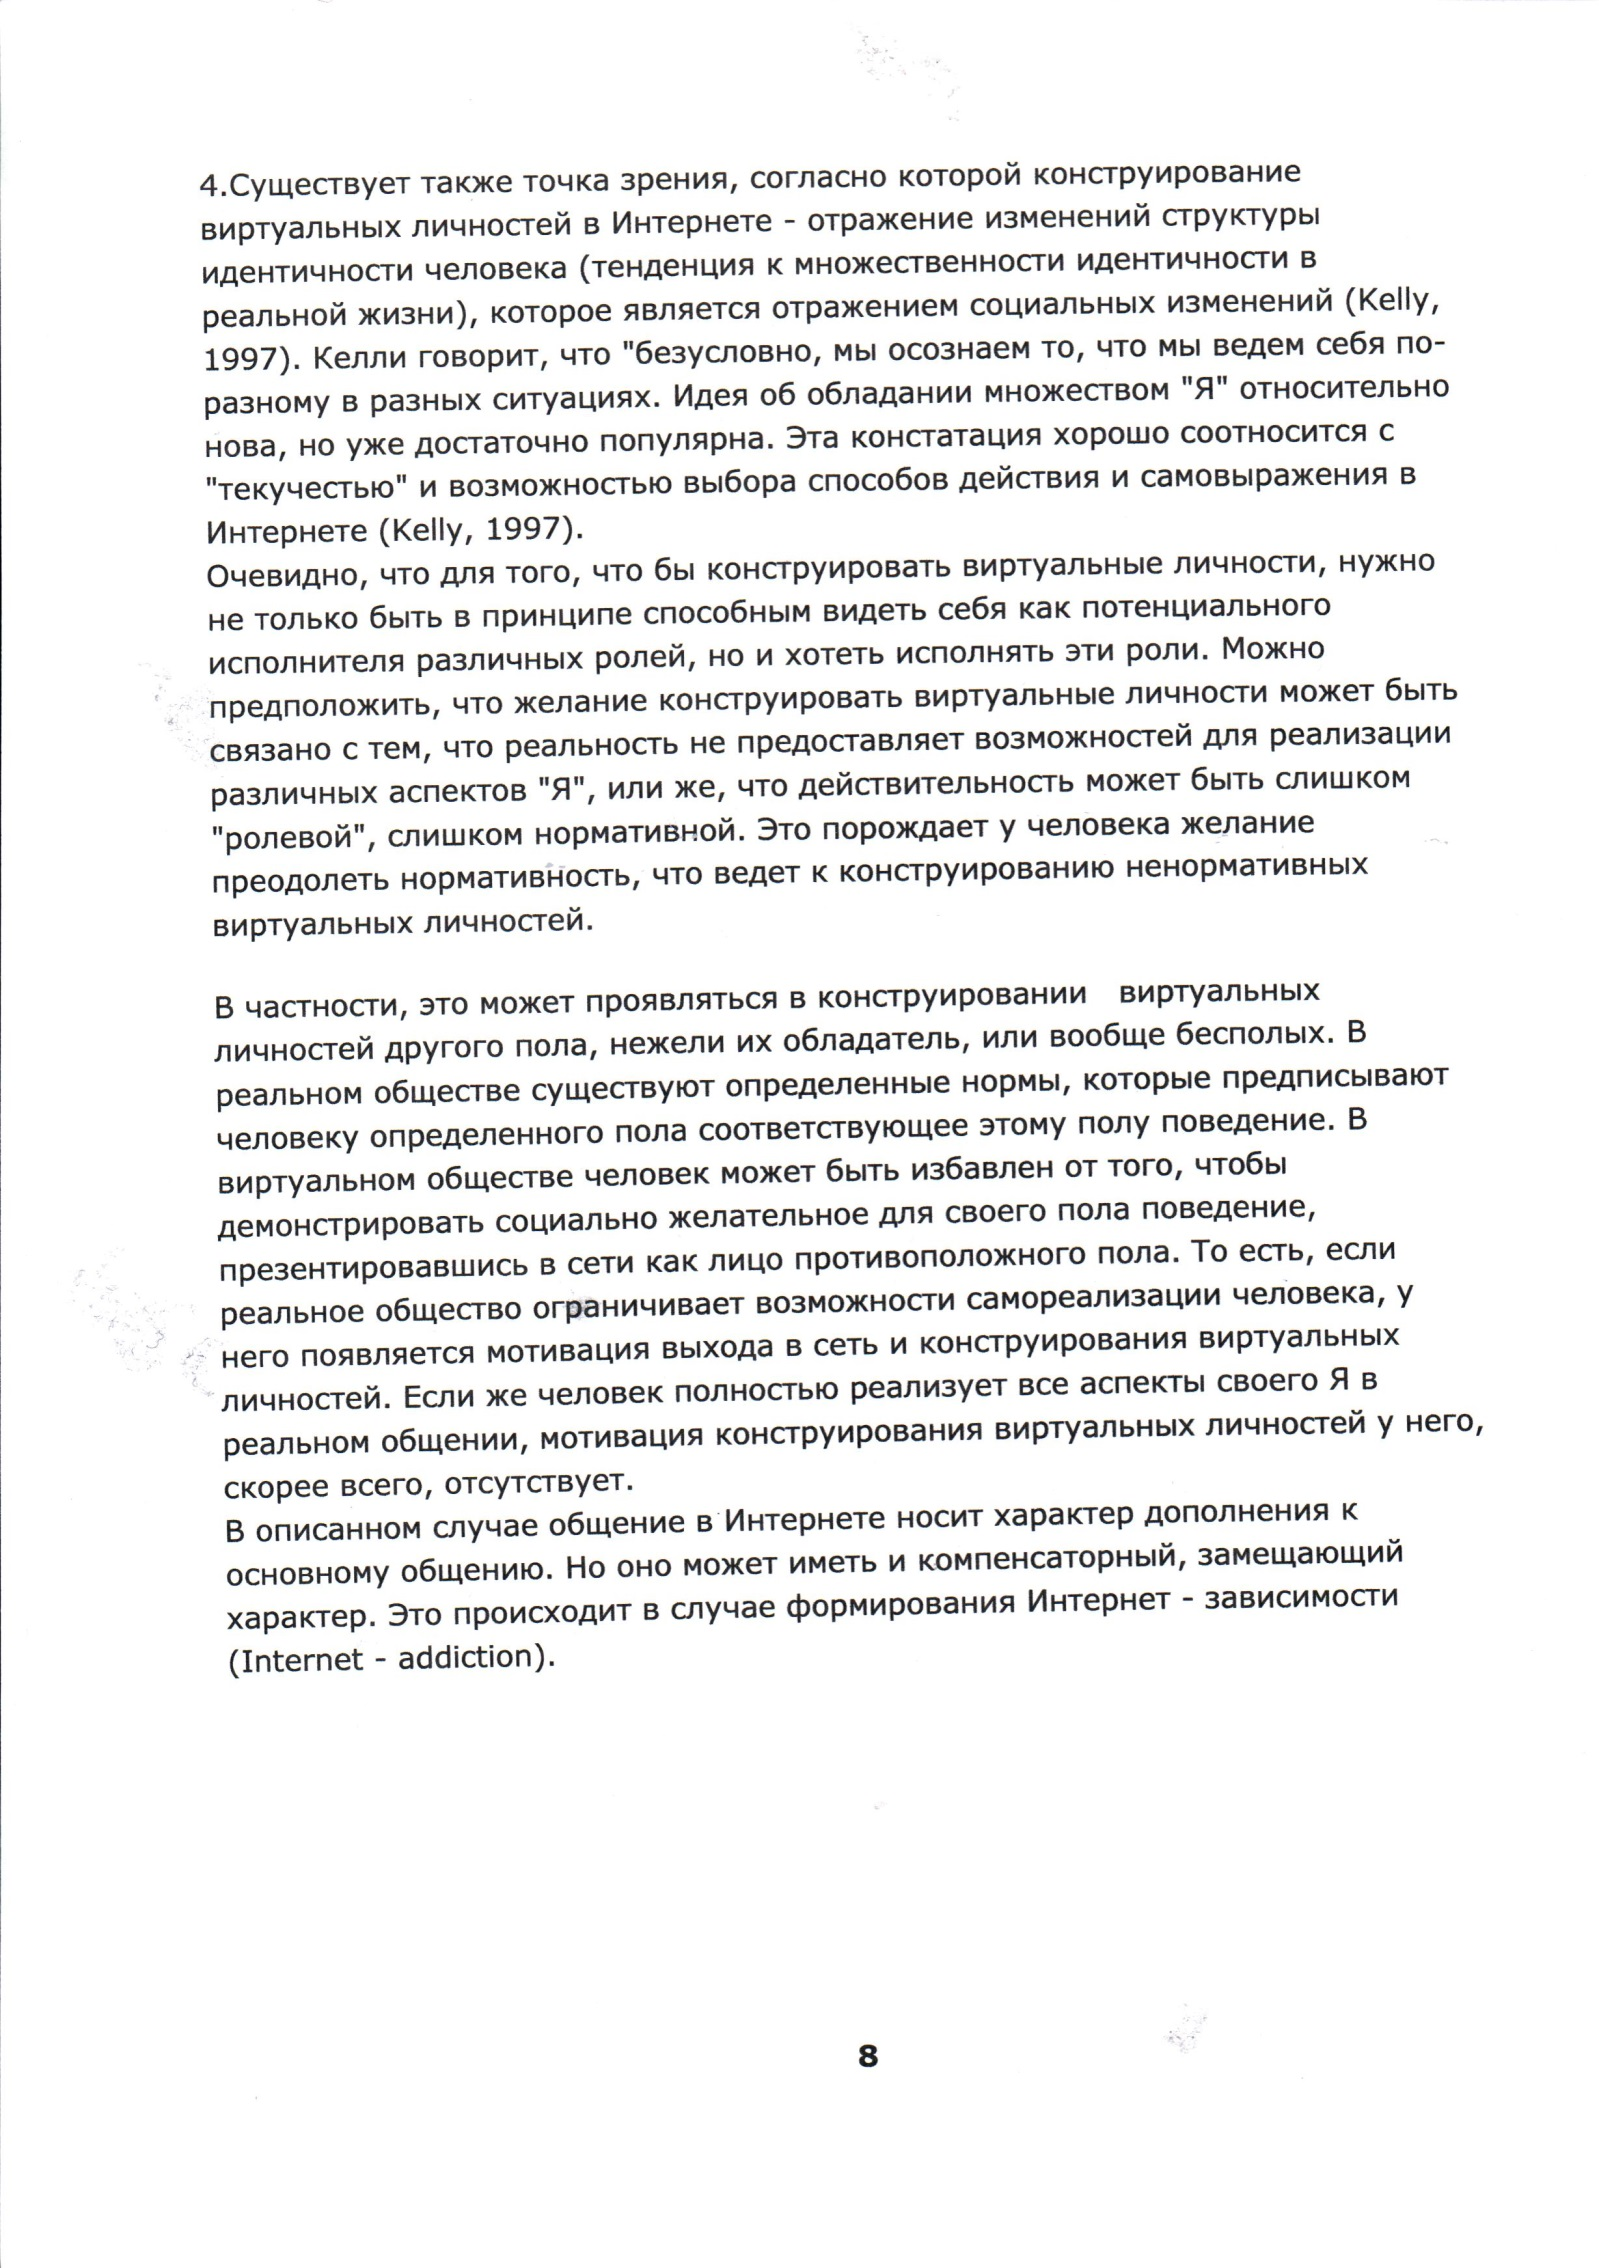 C:\Users\Ирина\Documents\Panasonic\MFS\Scan\20160225_104521.jpg